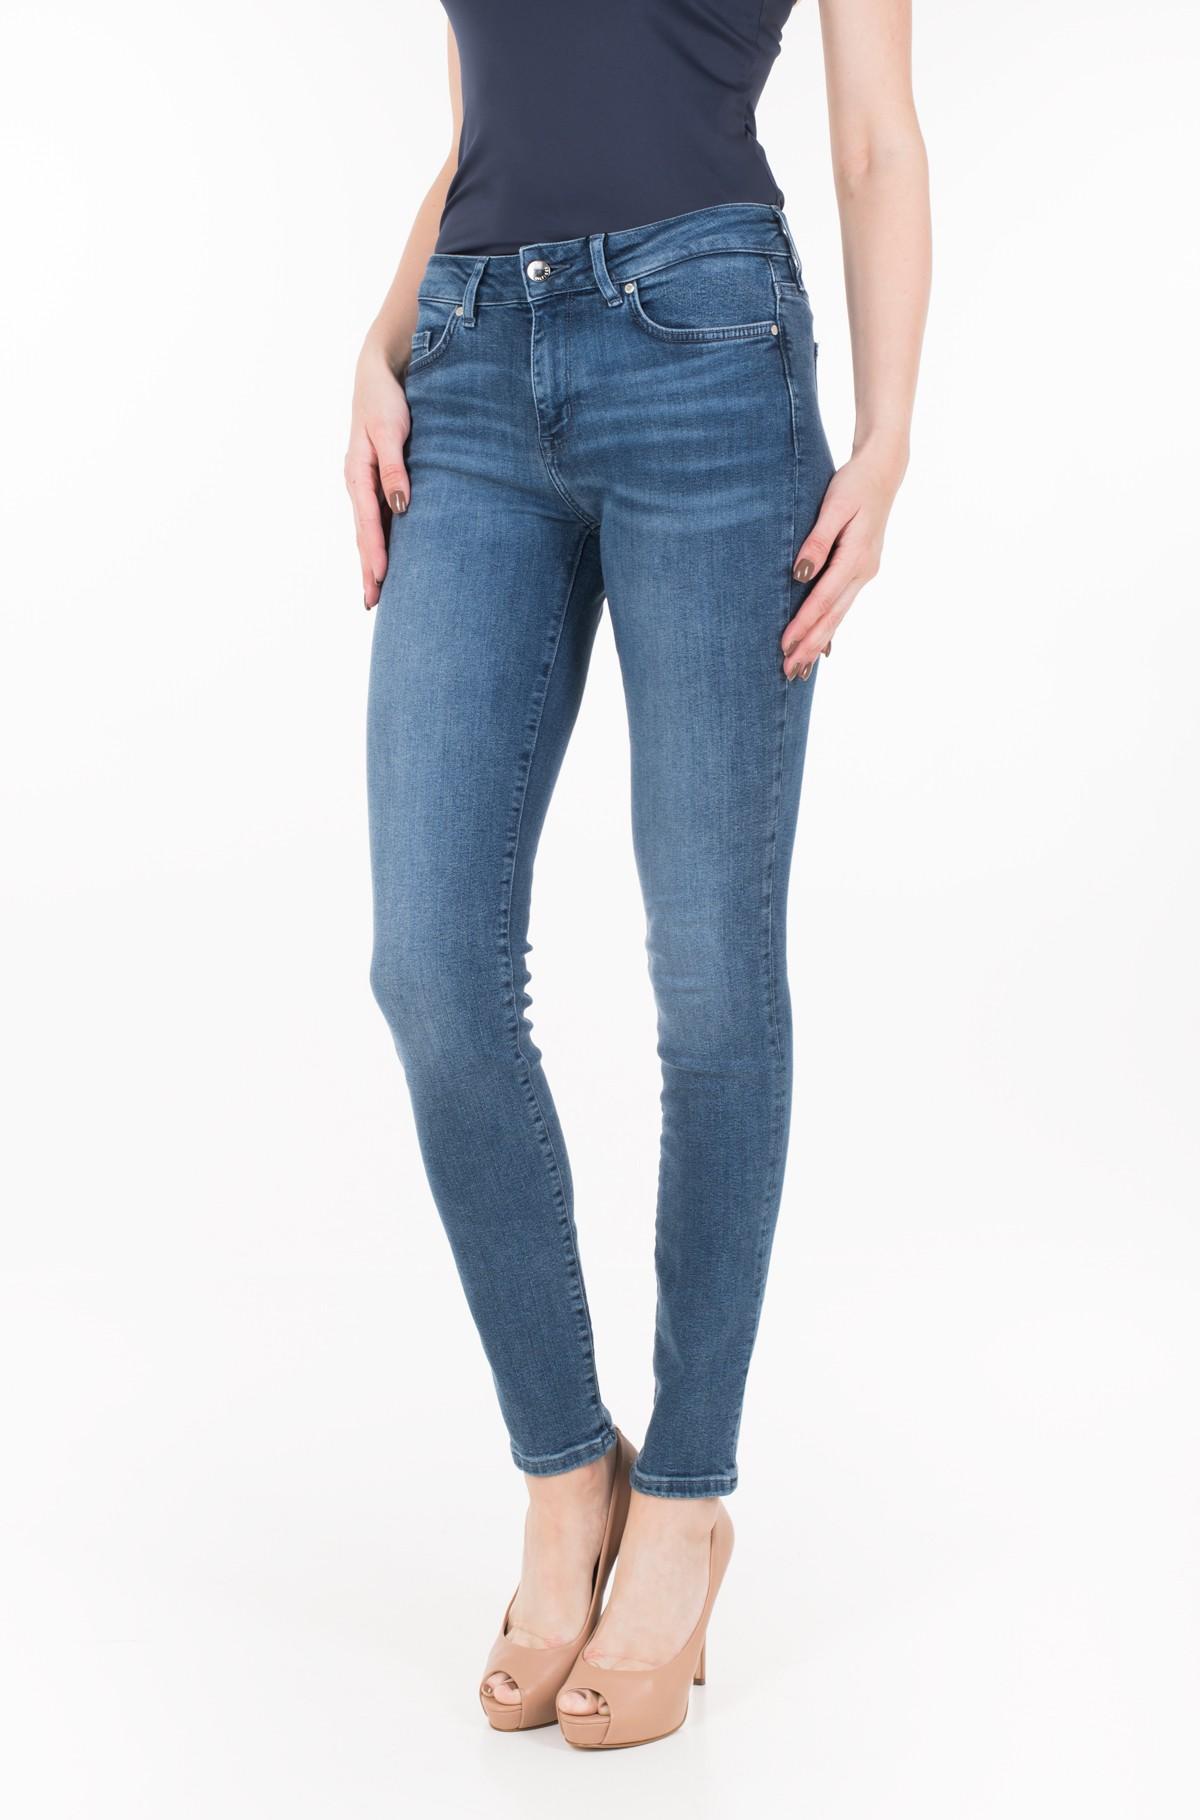 Jeans VENICE SLIM RW KELLY-full-1